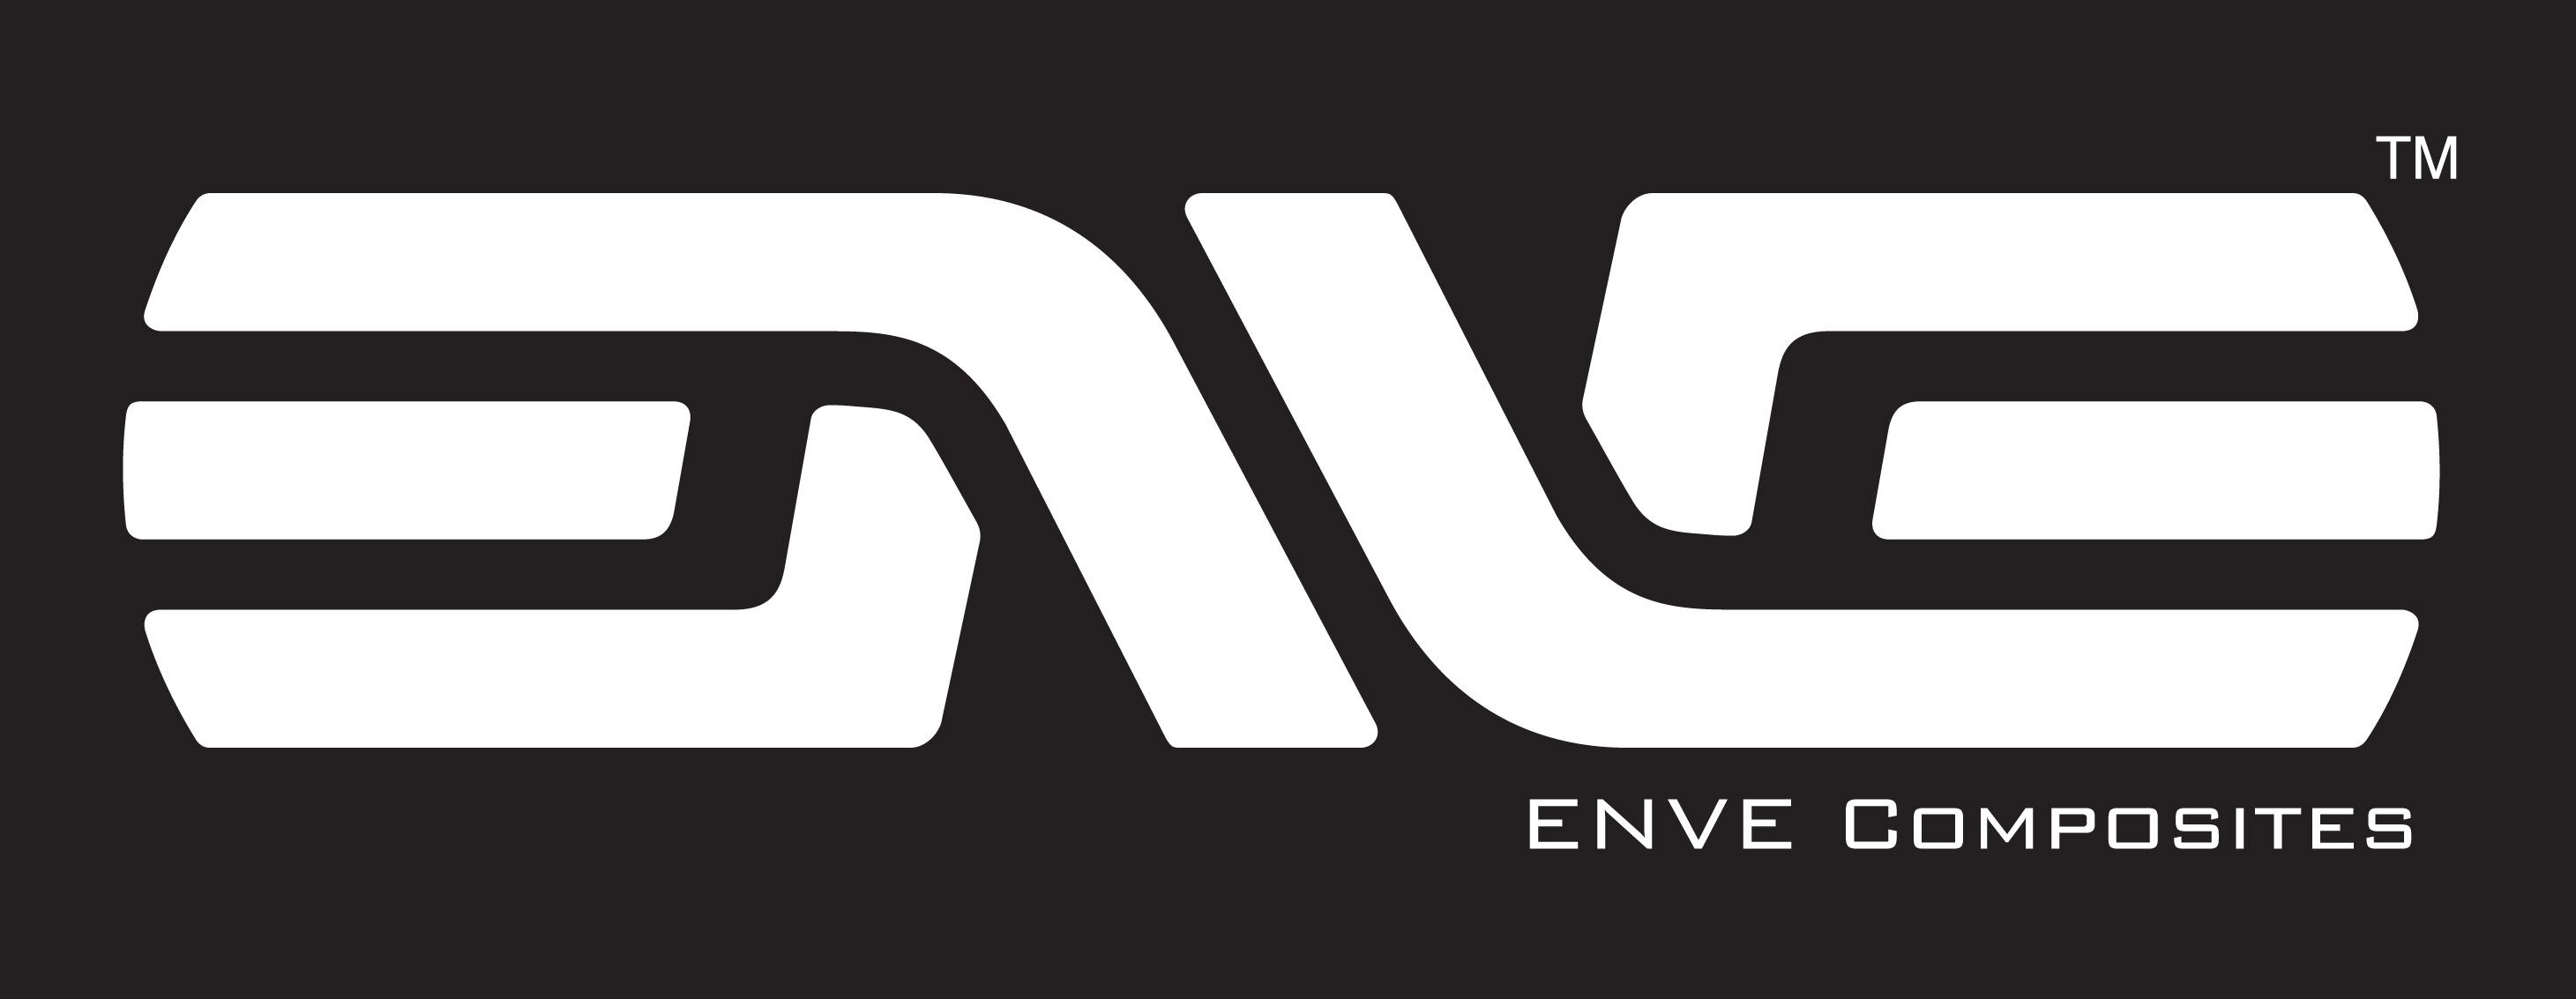 Risultati immagini per logo enve